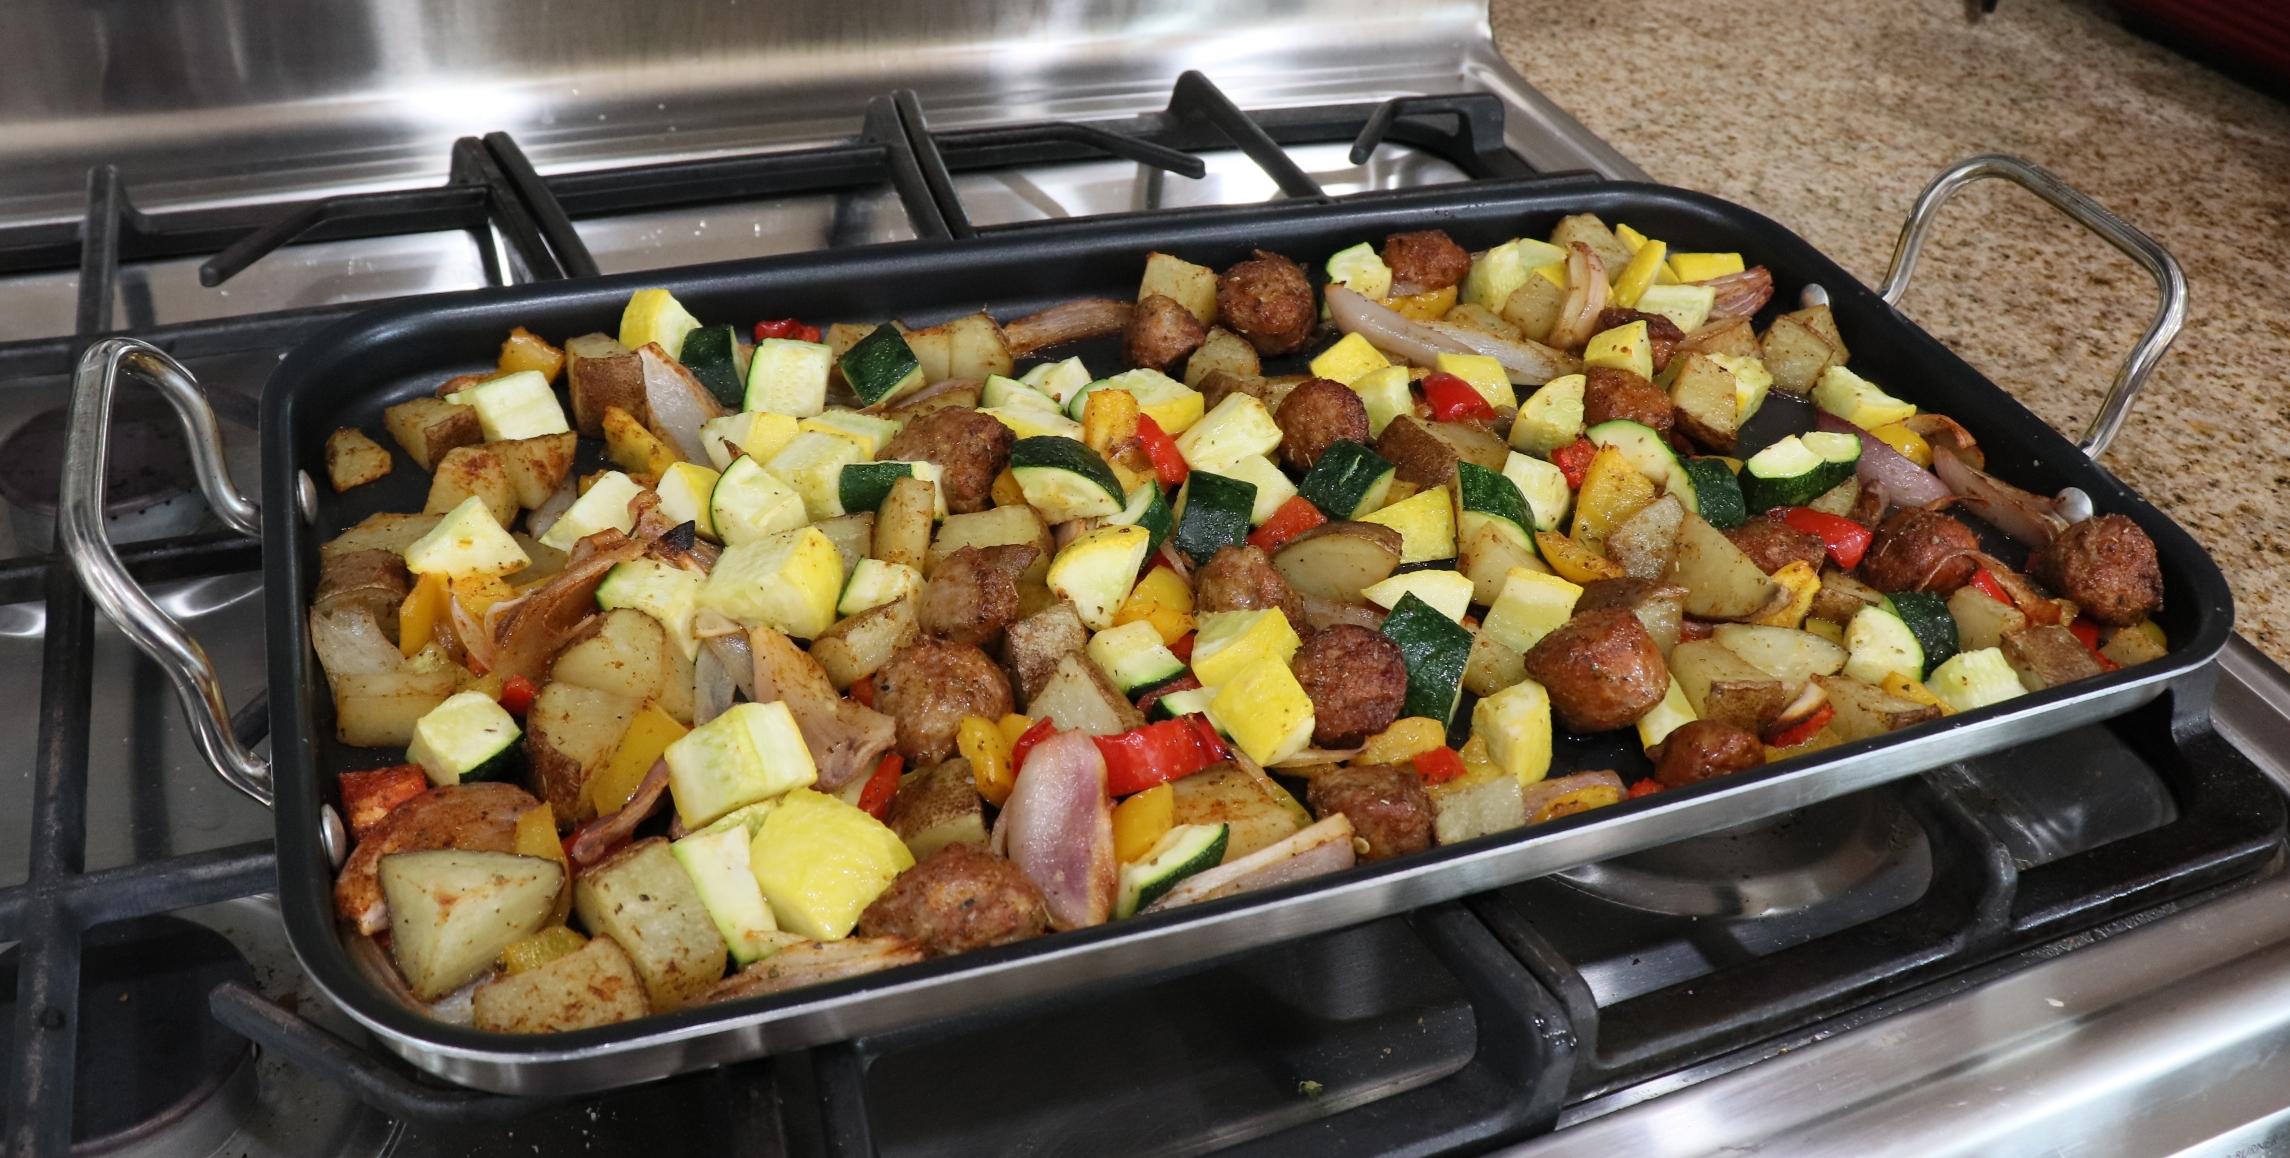 Sausage, Shallot, and Squash One-Pan Meal